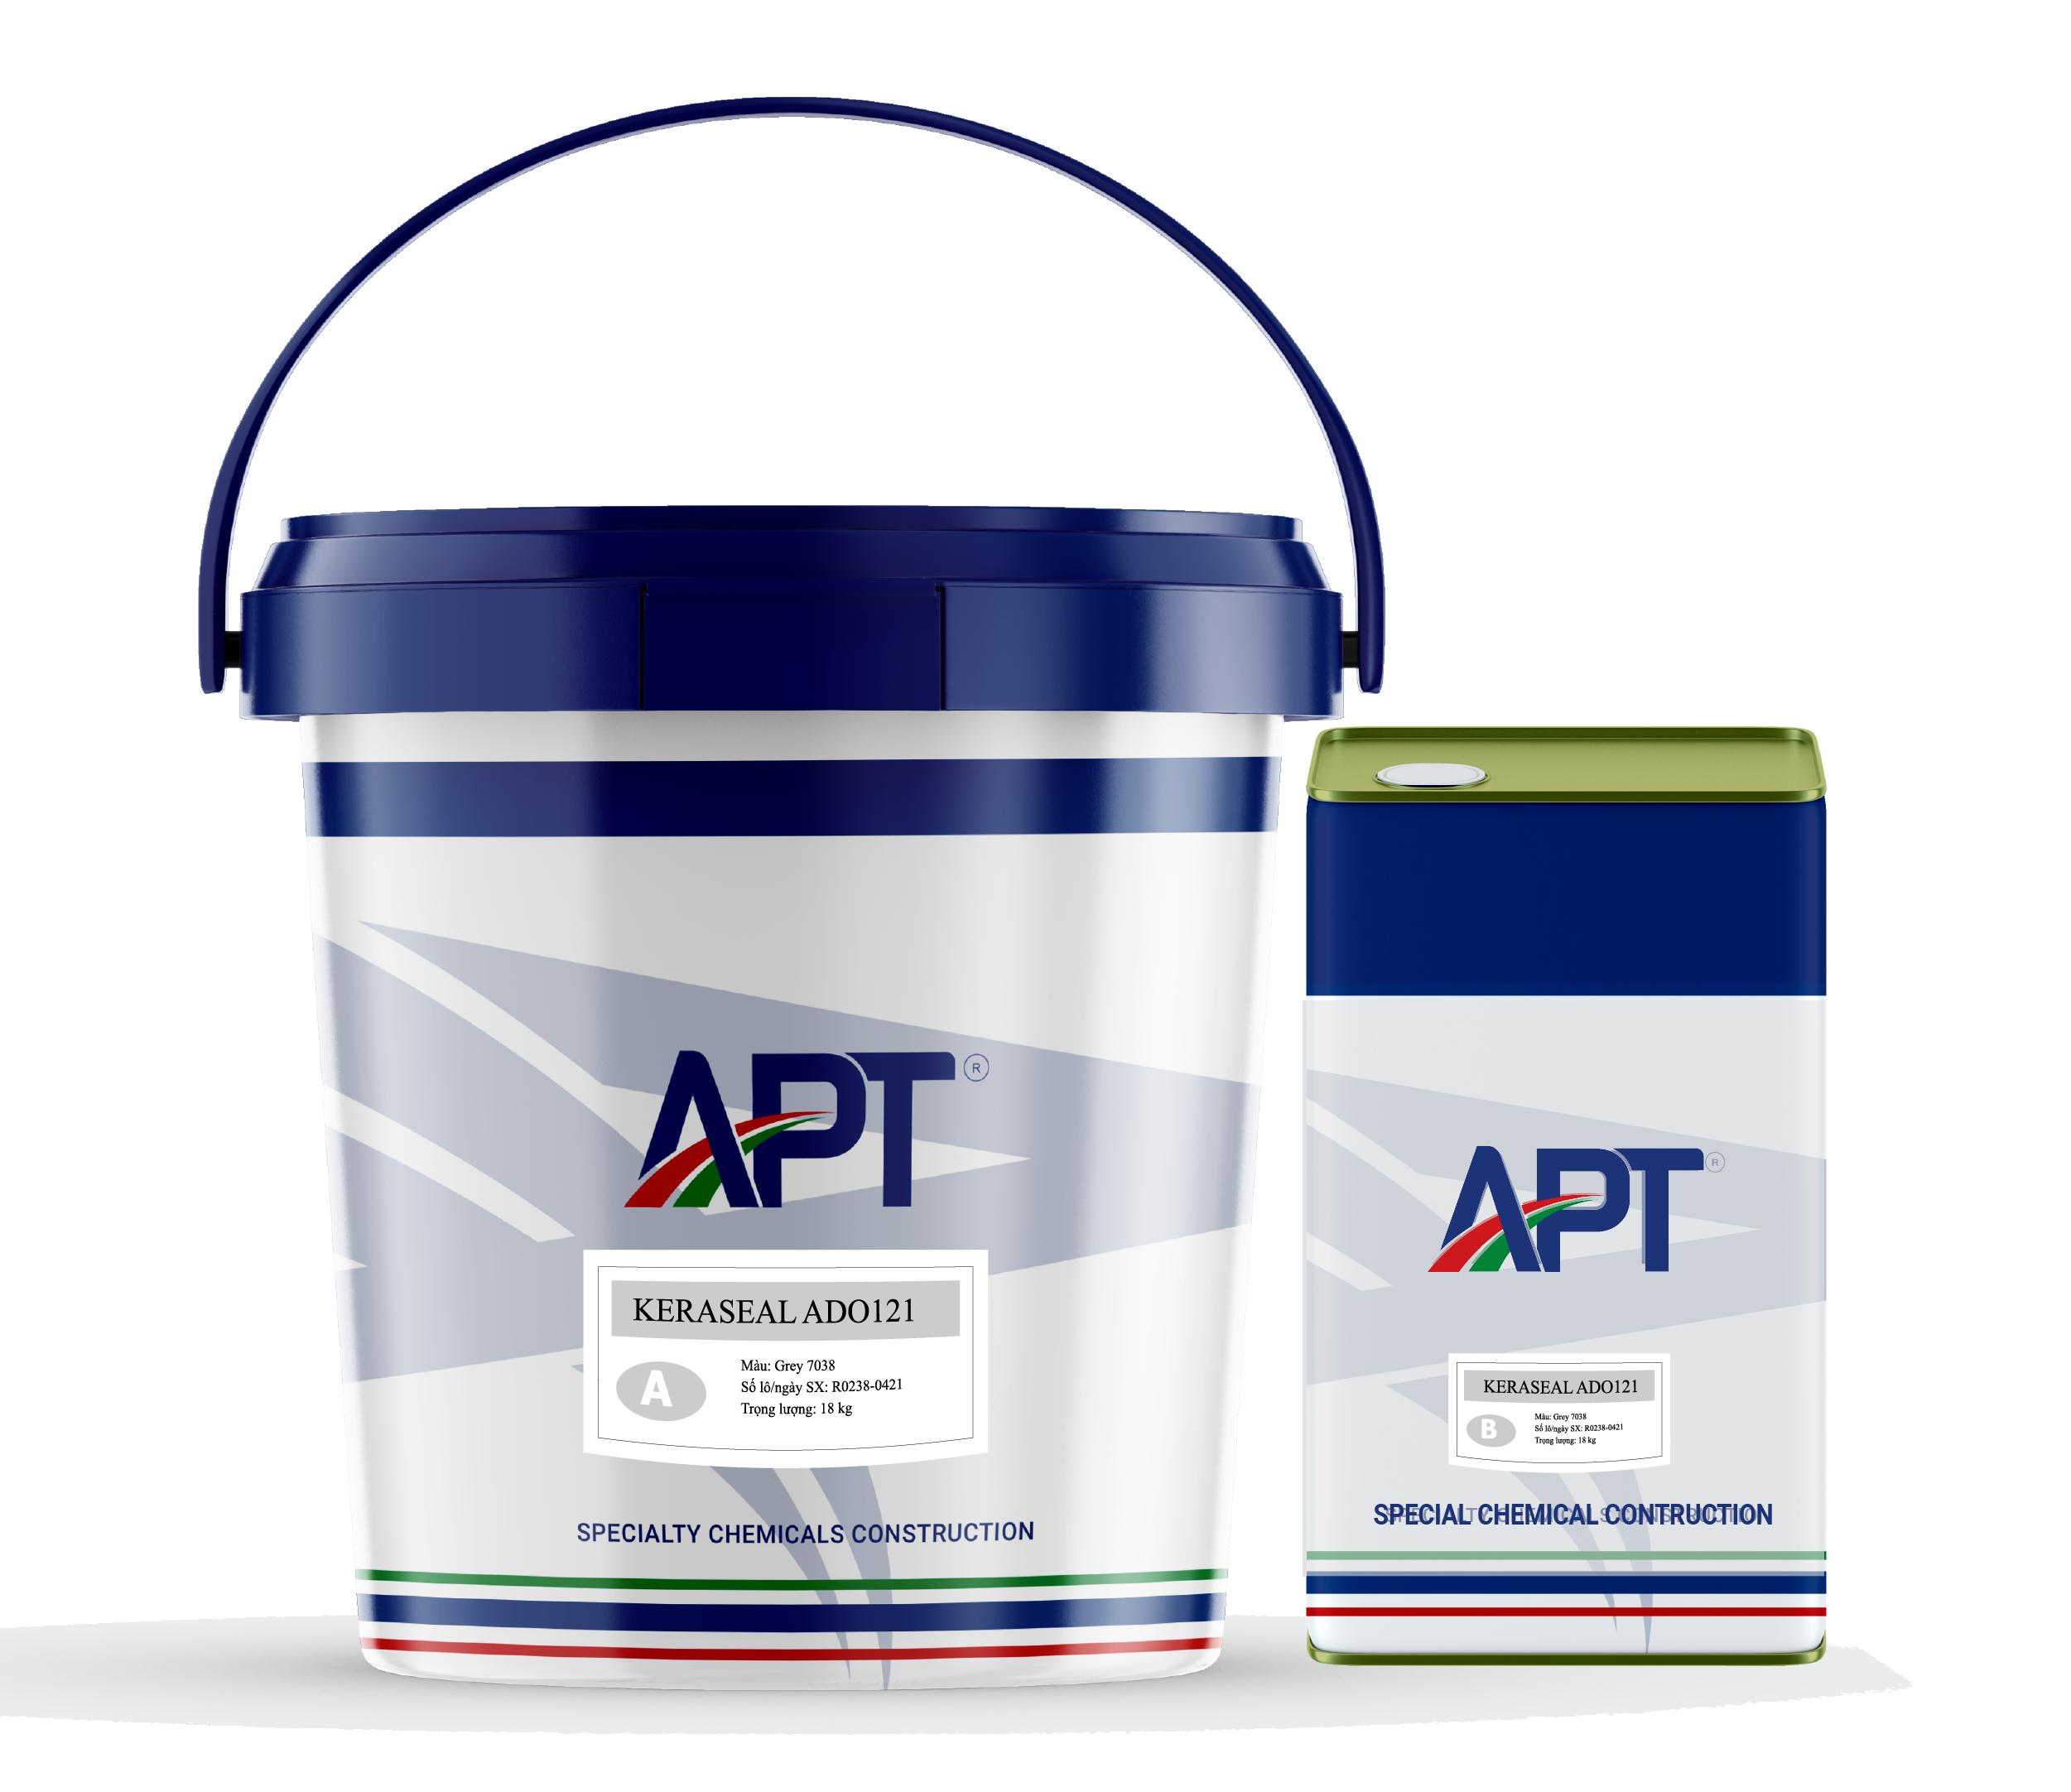 Solvent-free epoxy coating system KERASEAL ADO121